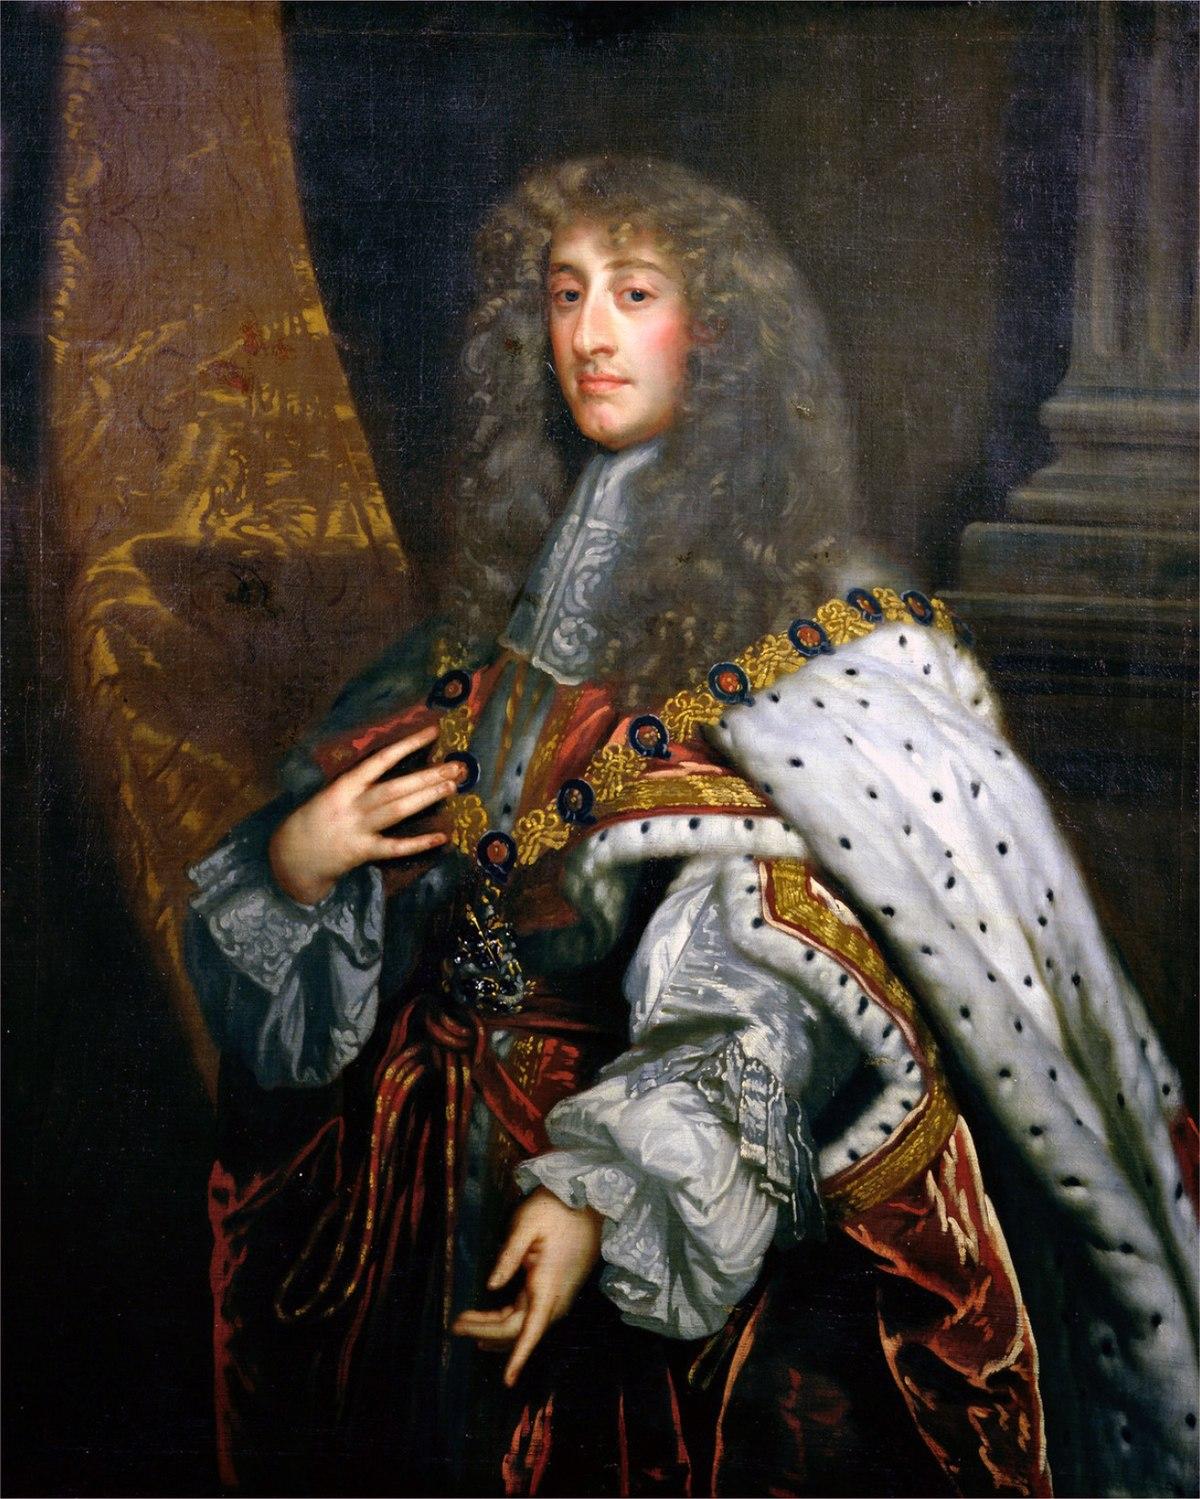 King Francis Ii Illegitimate Child : francis, illegitimate, child, James, England, Wikipedia